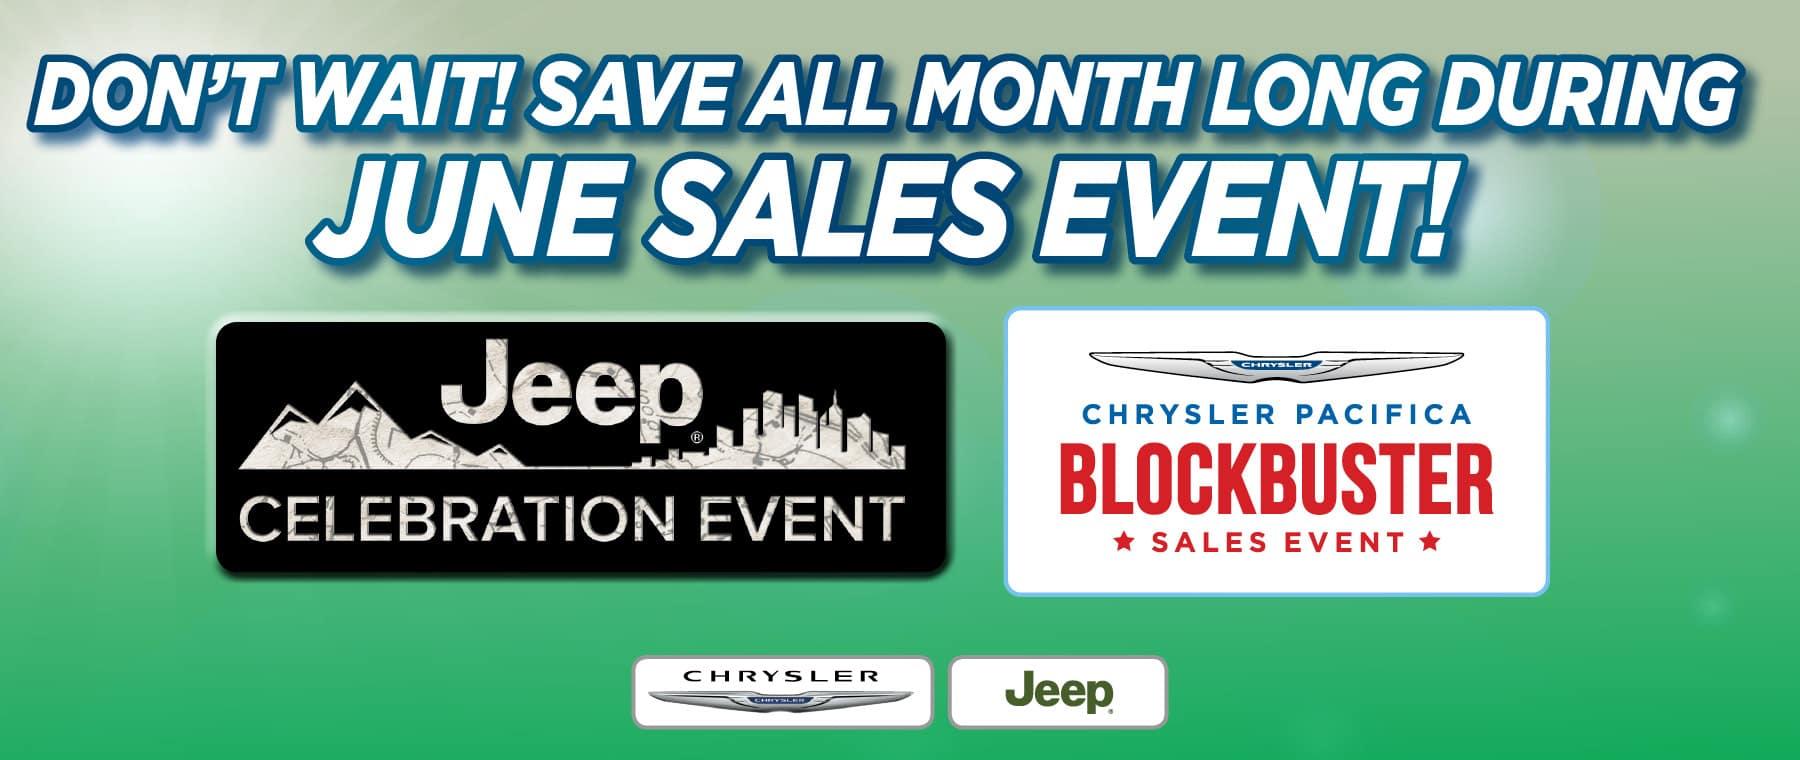 June Sales Event